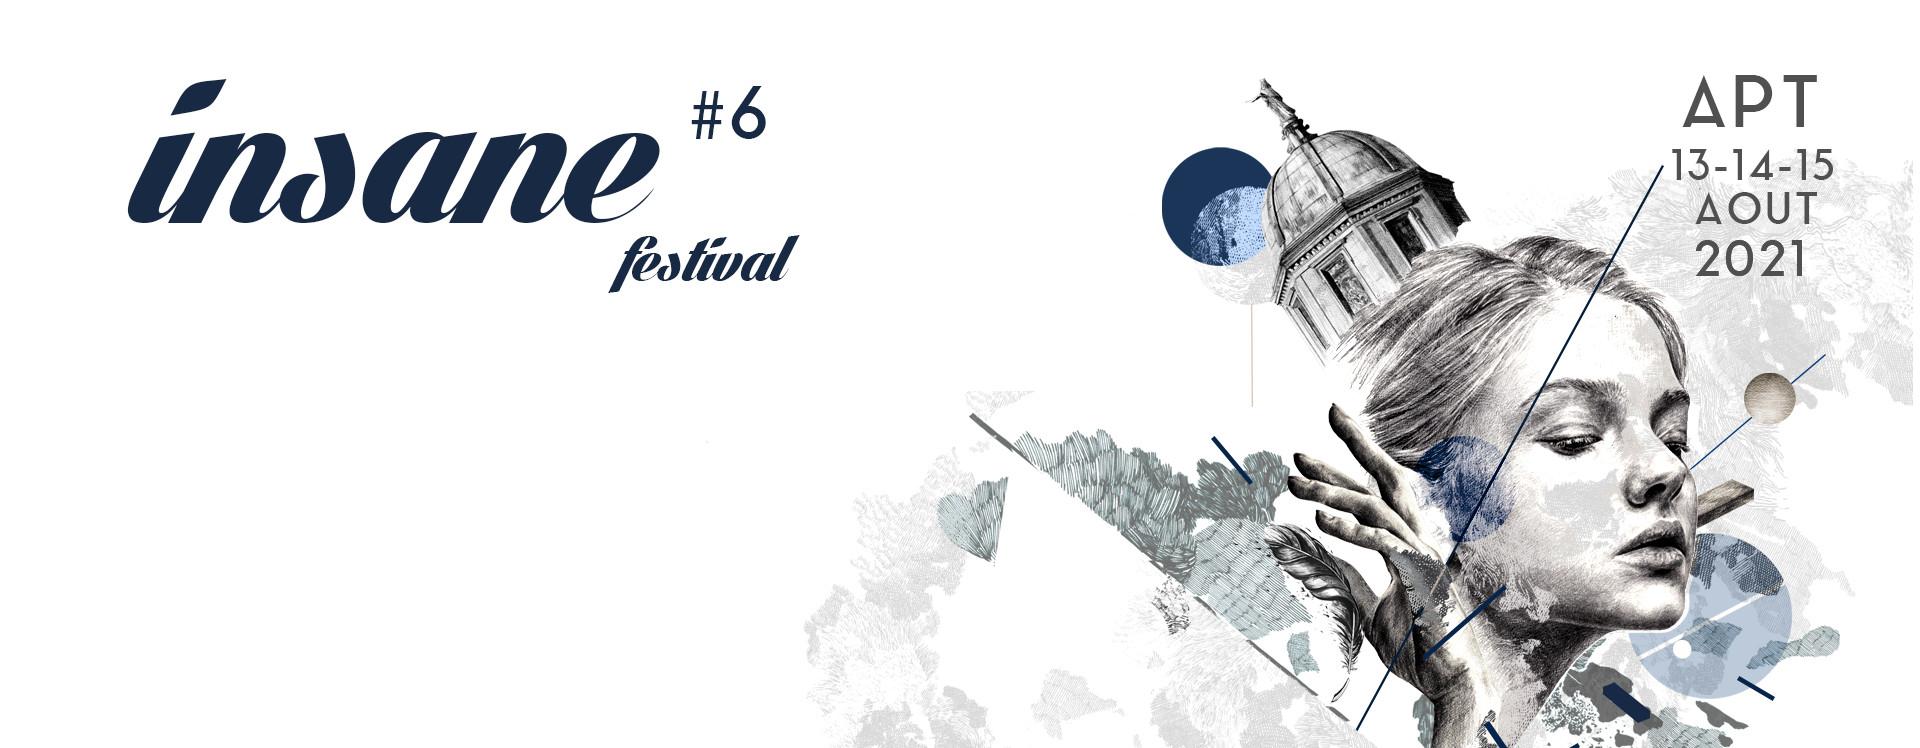 annonce Insane festival 2021